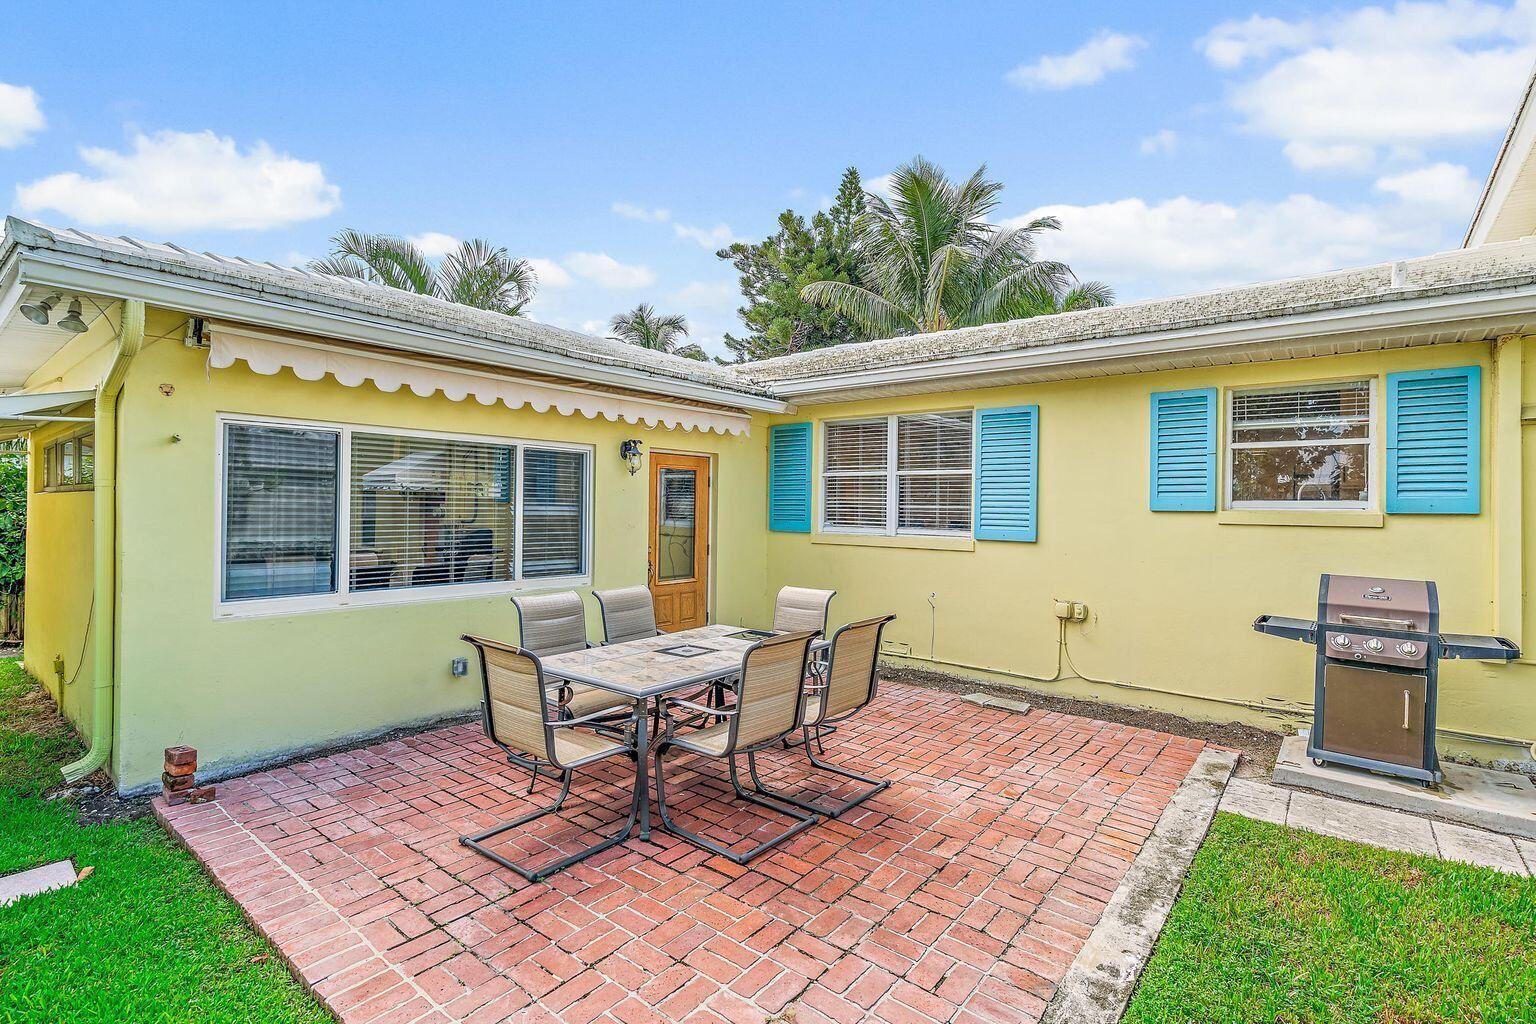 Photo of 207 Blossom Lane, Palm Beach Shores, FL 33404 (MLS # RX-10716972)